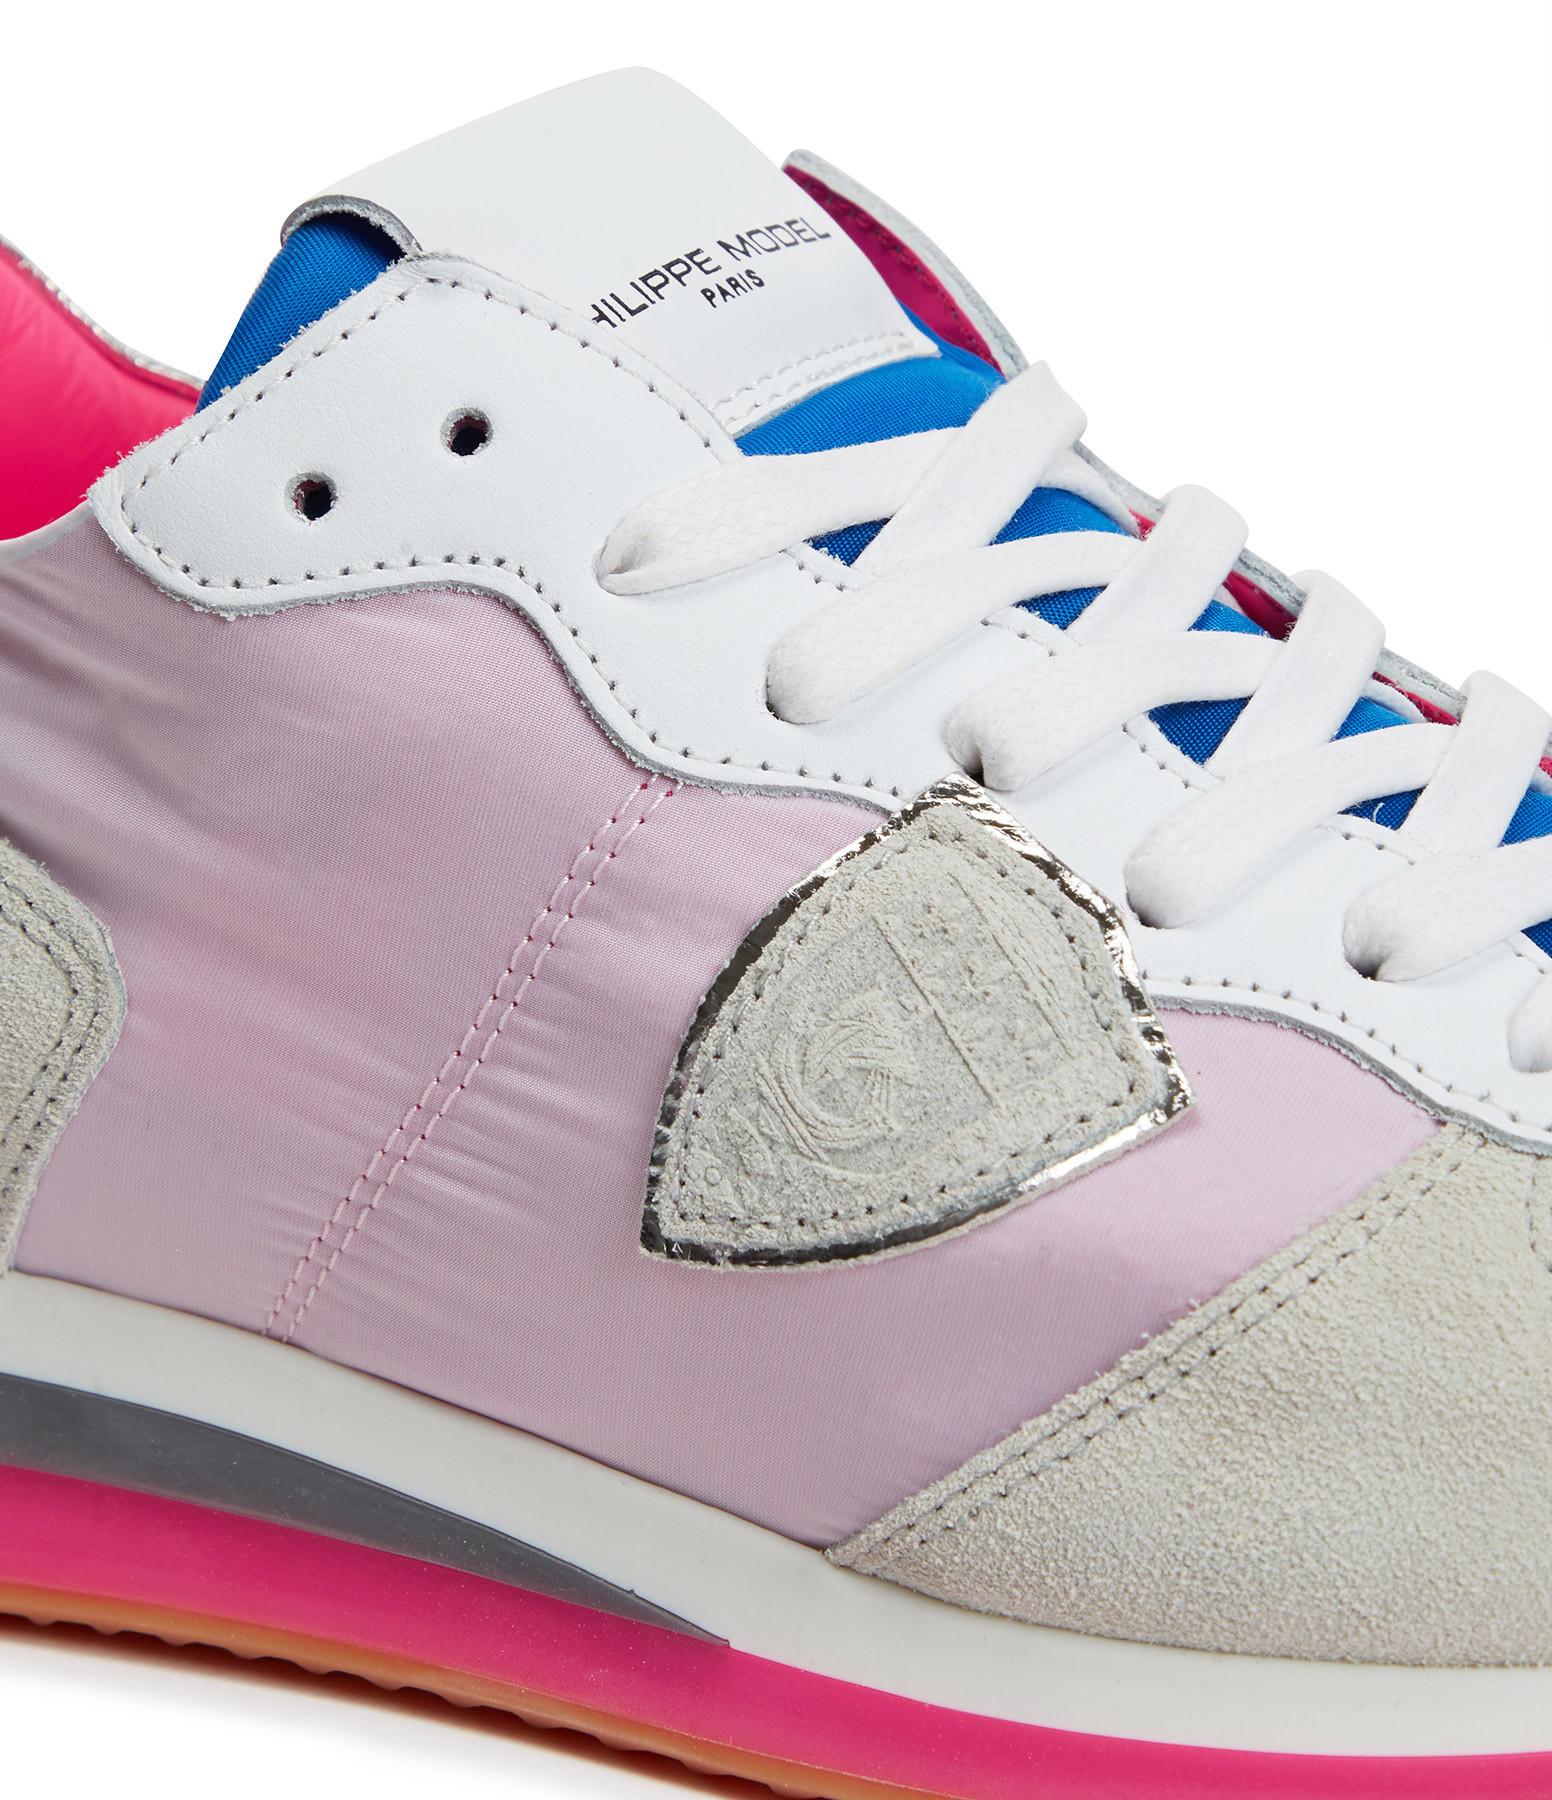 PHILIPPE MODEL - Baskets Trpx Neon Pop Blanc Fushia